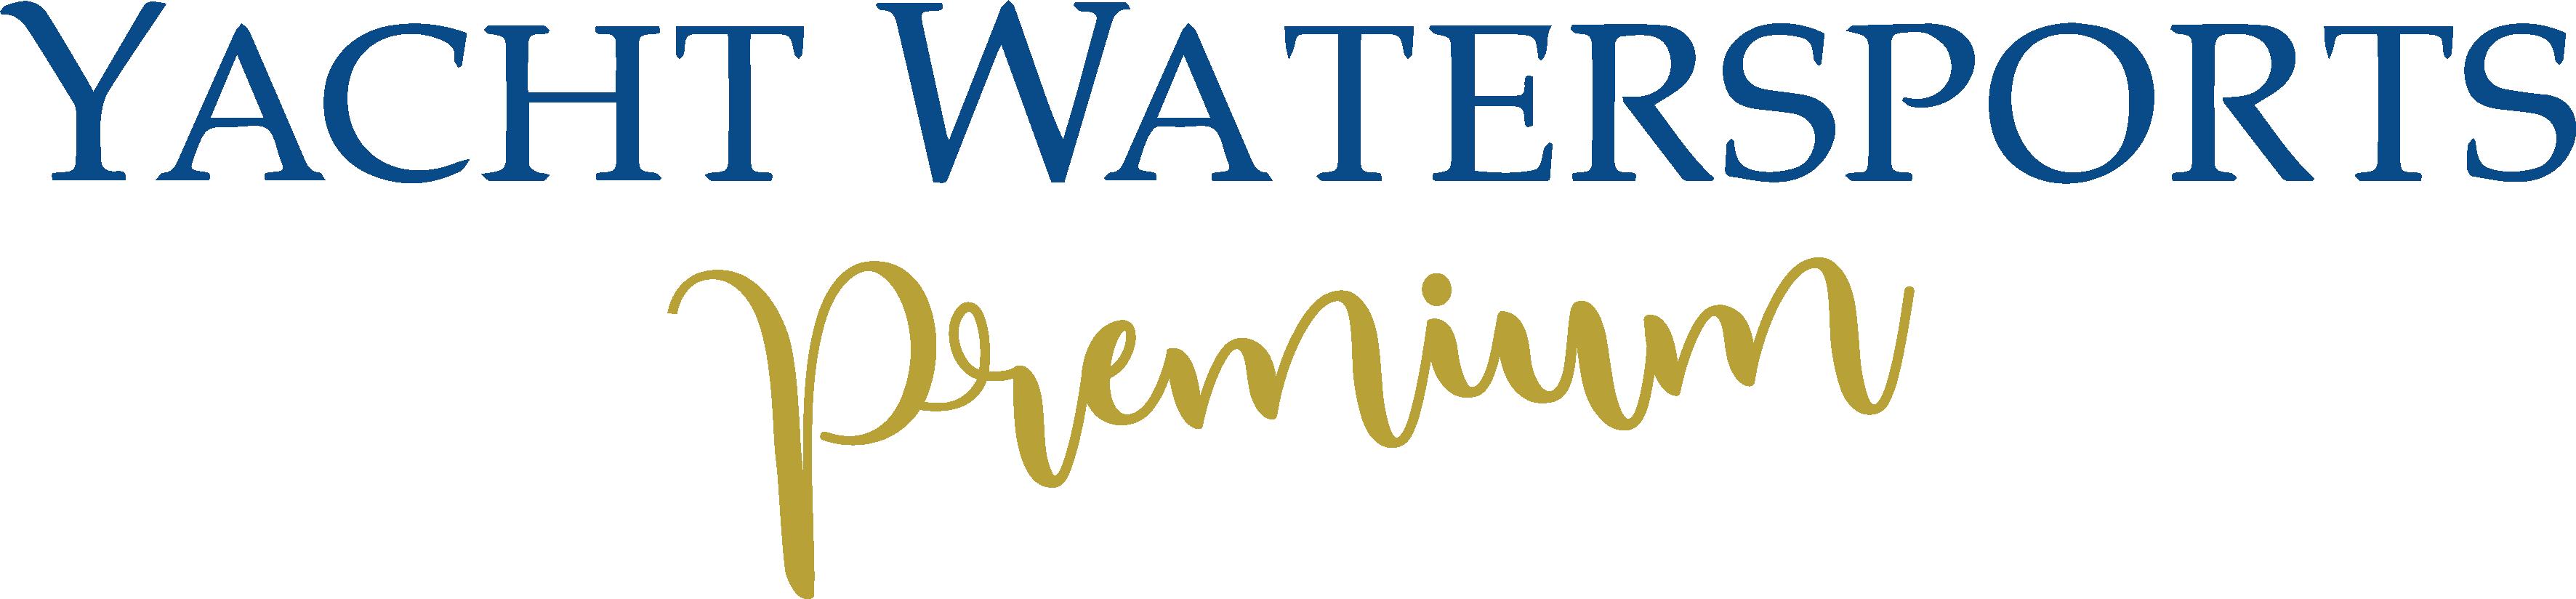 yachtwatersports